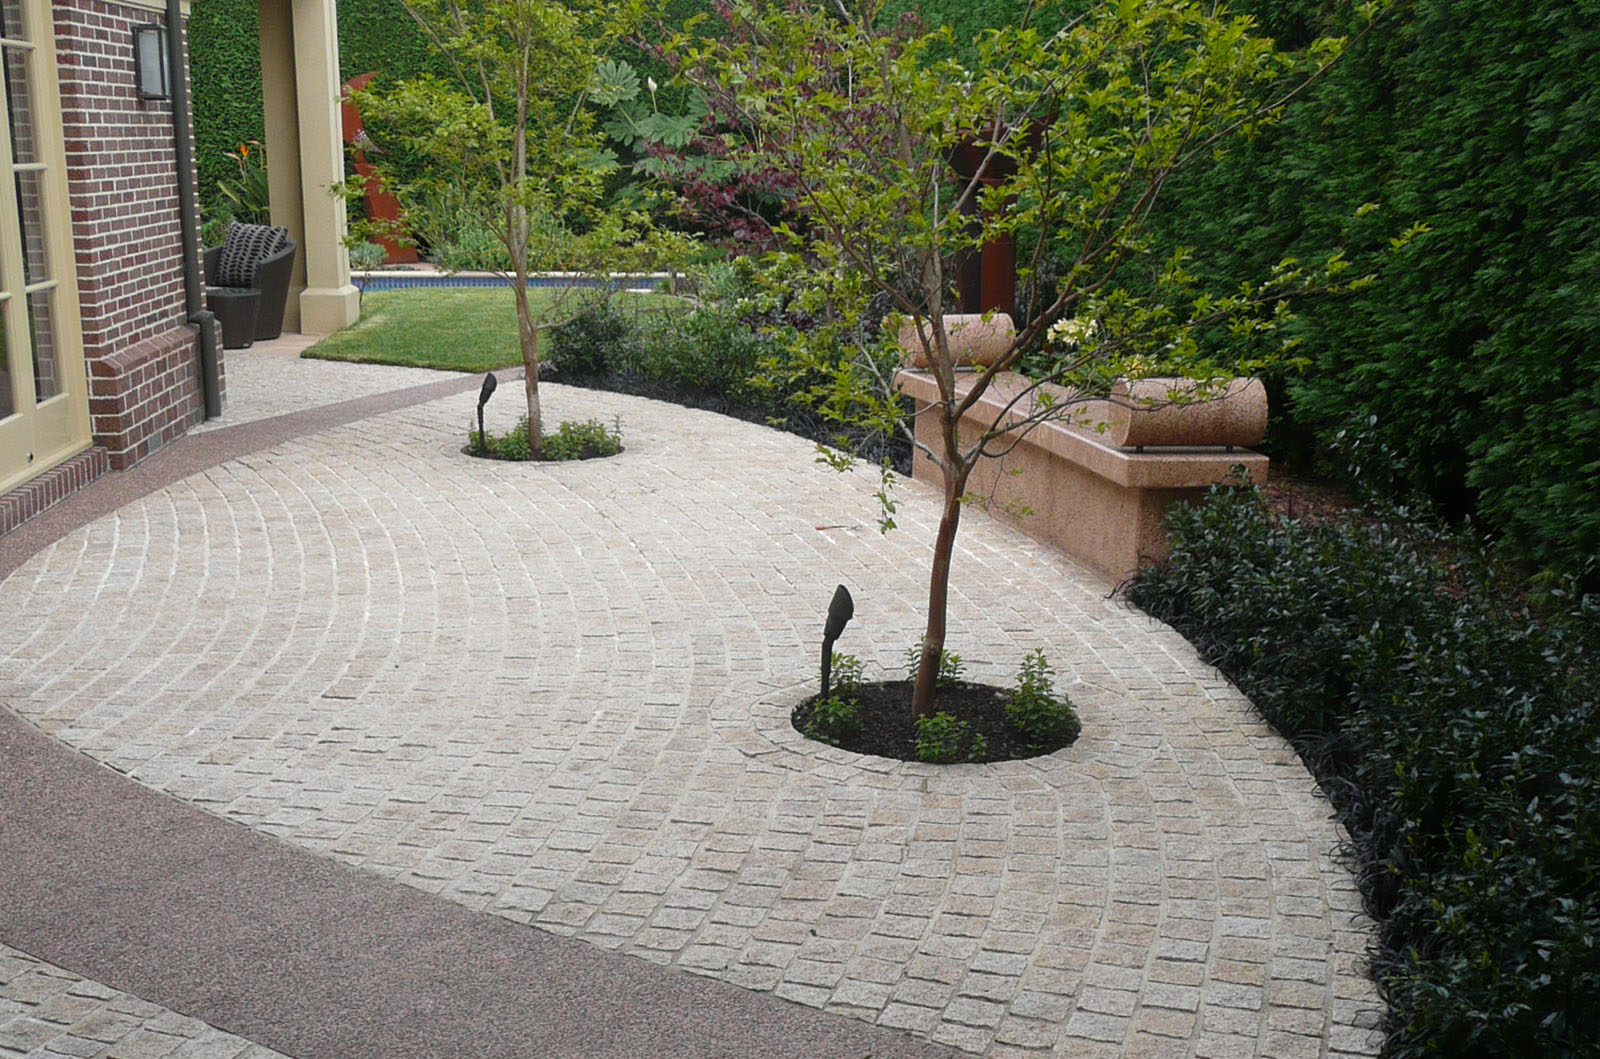 Sculptured Garden_0005s_0005_Hughes 4